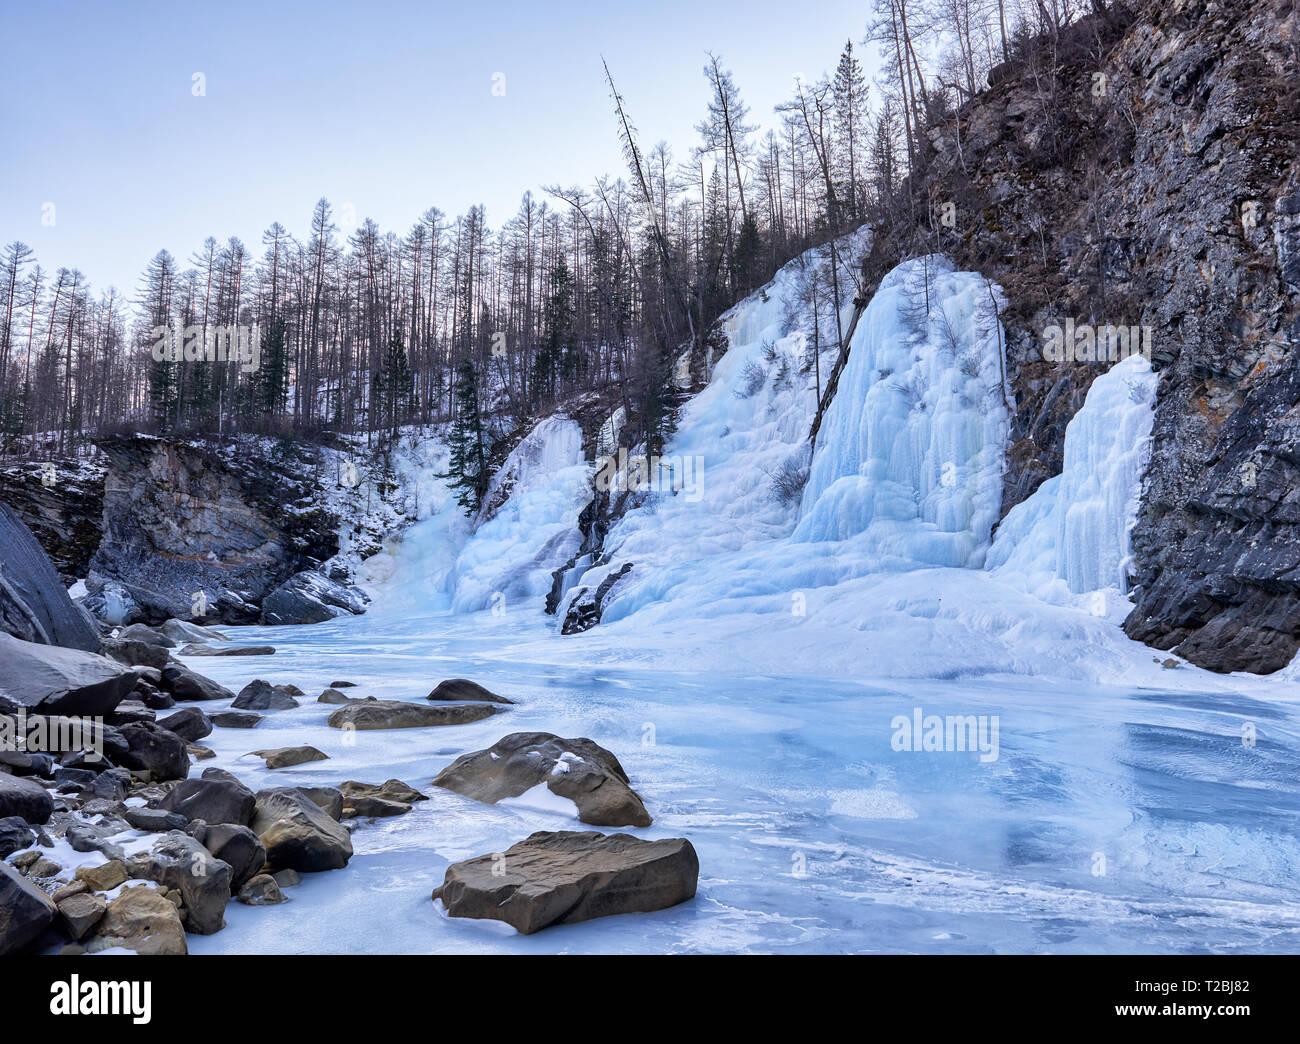 Schöner Eisfall aus gefrorenem Wasser. Fluss Uda. Tofalaria. Irkutsk Region Stockbild